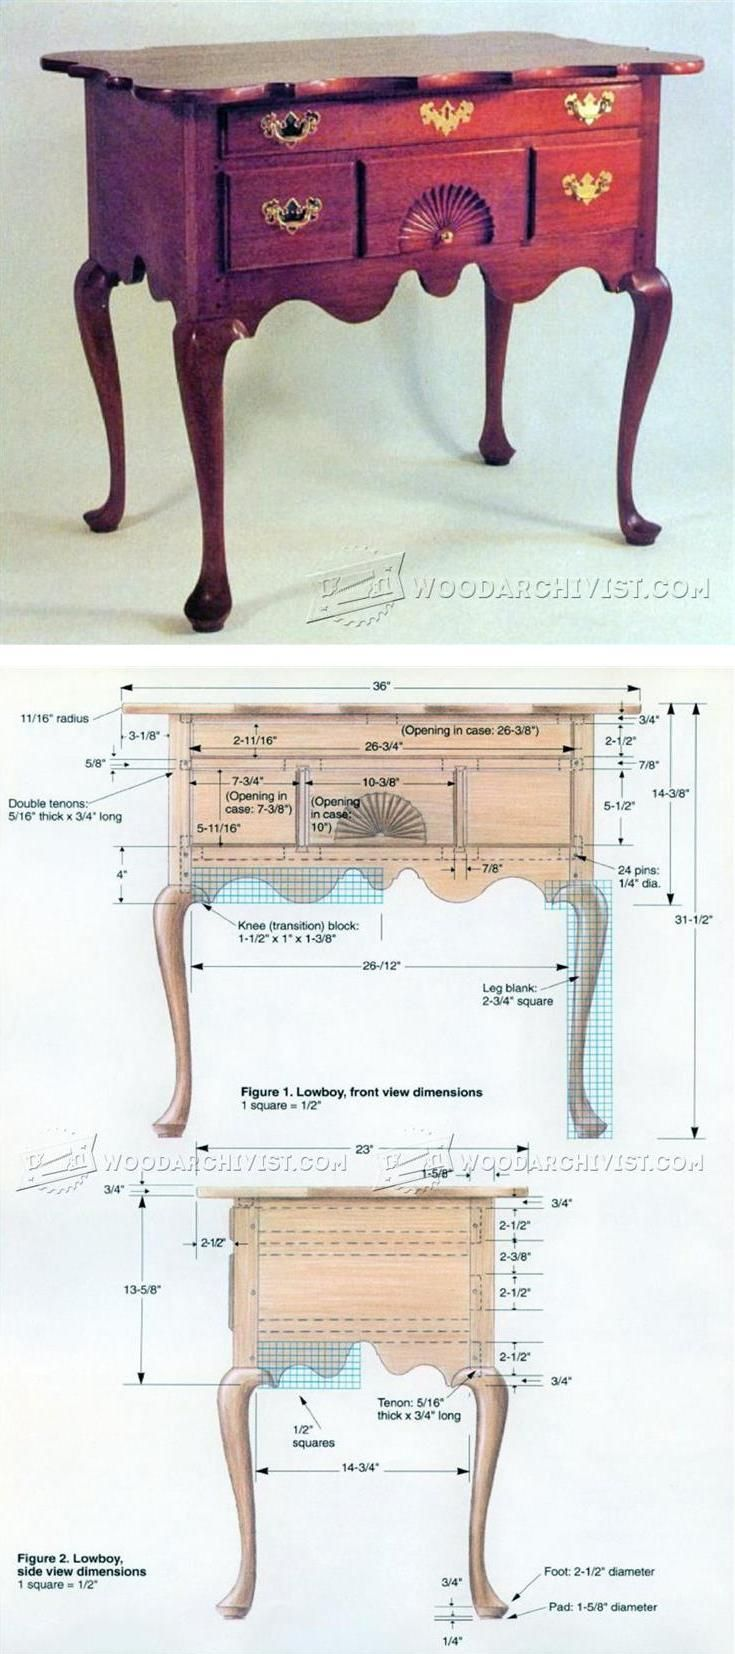 Lowboy Plans - Furniture Plans and Projects | WoodArchivist.com